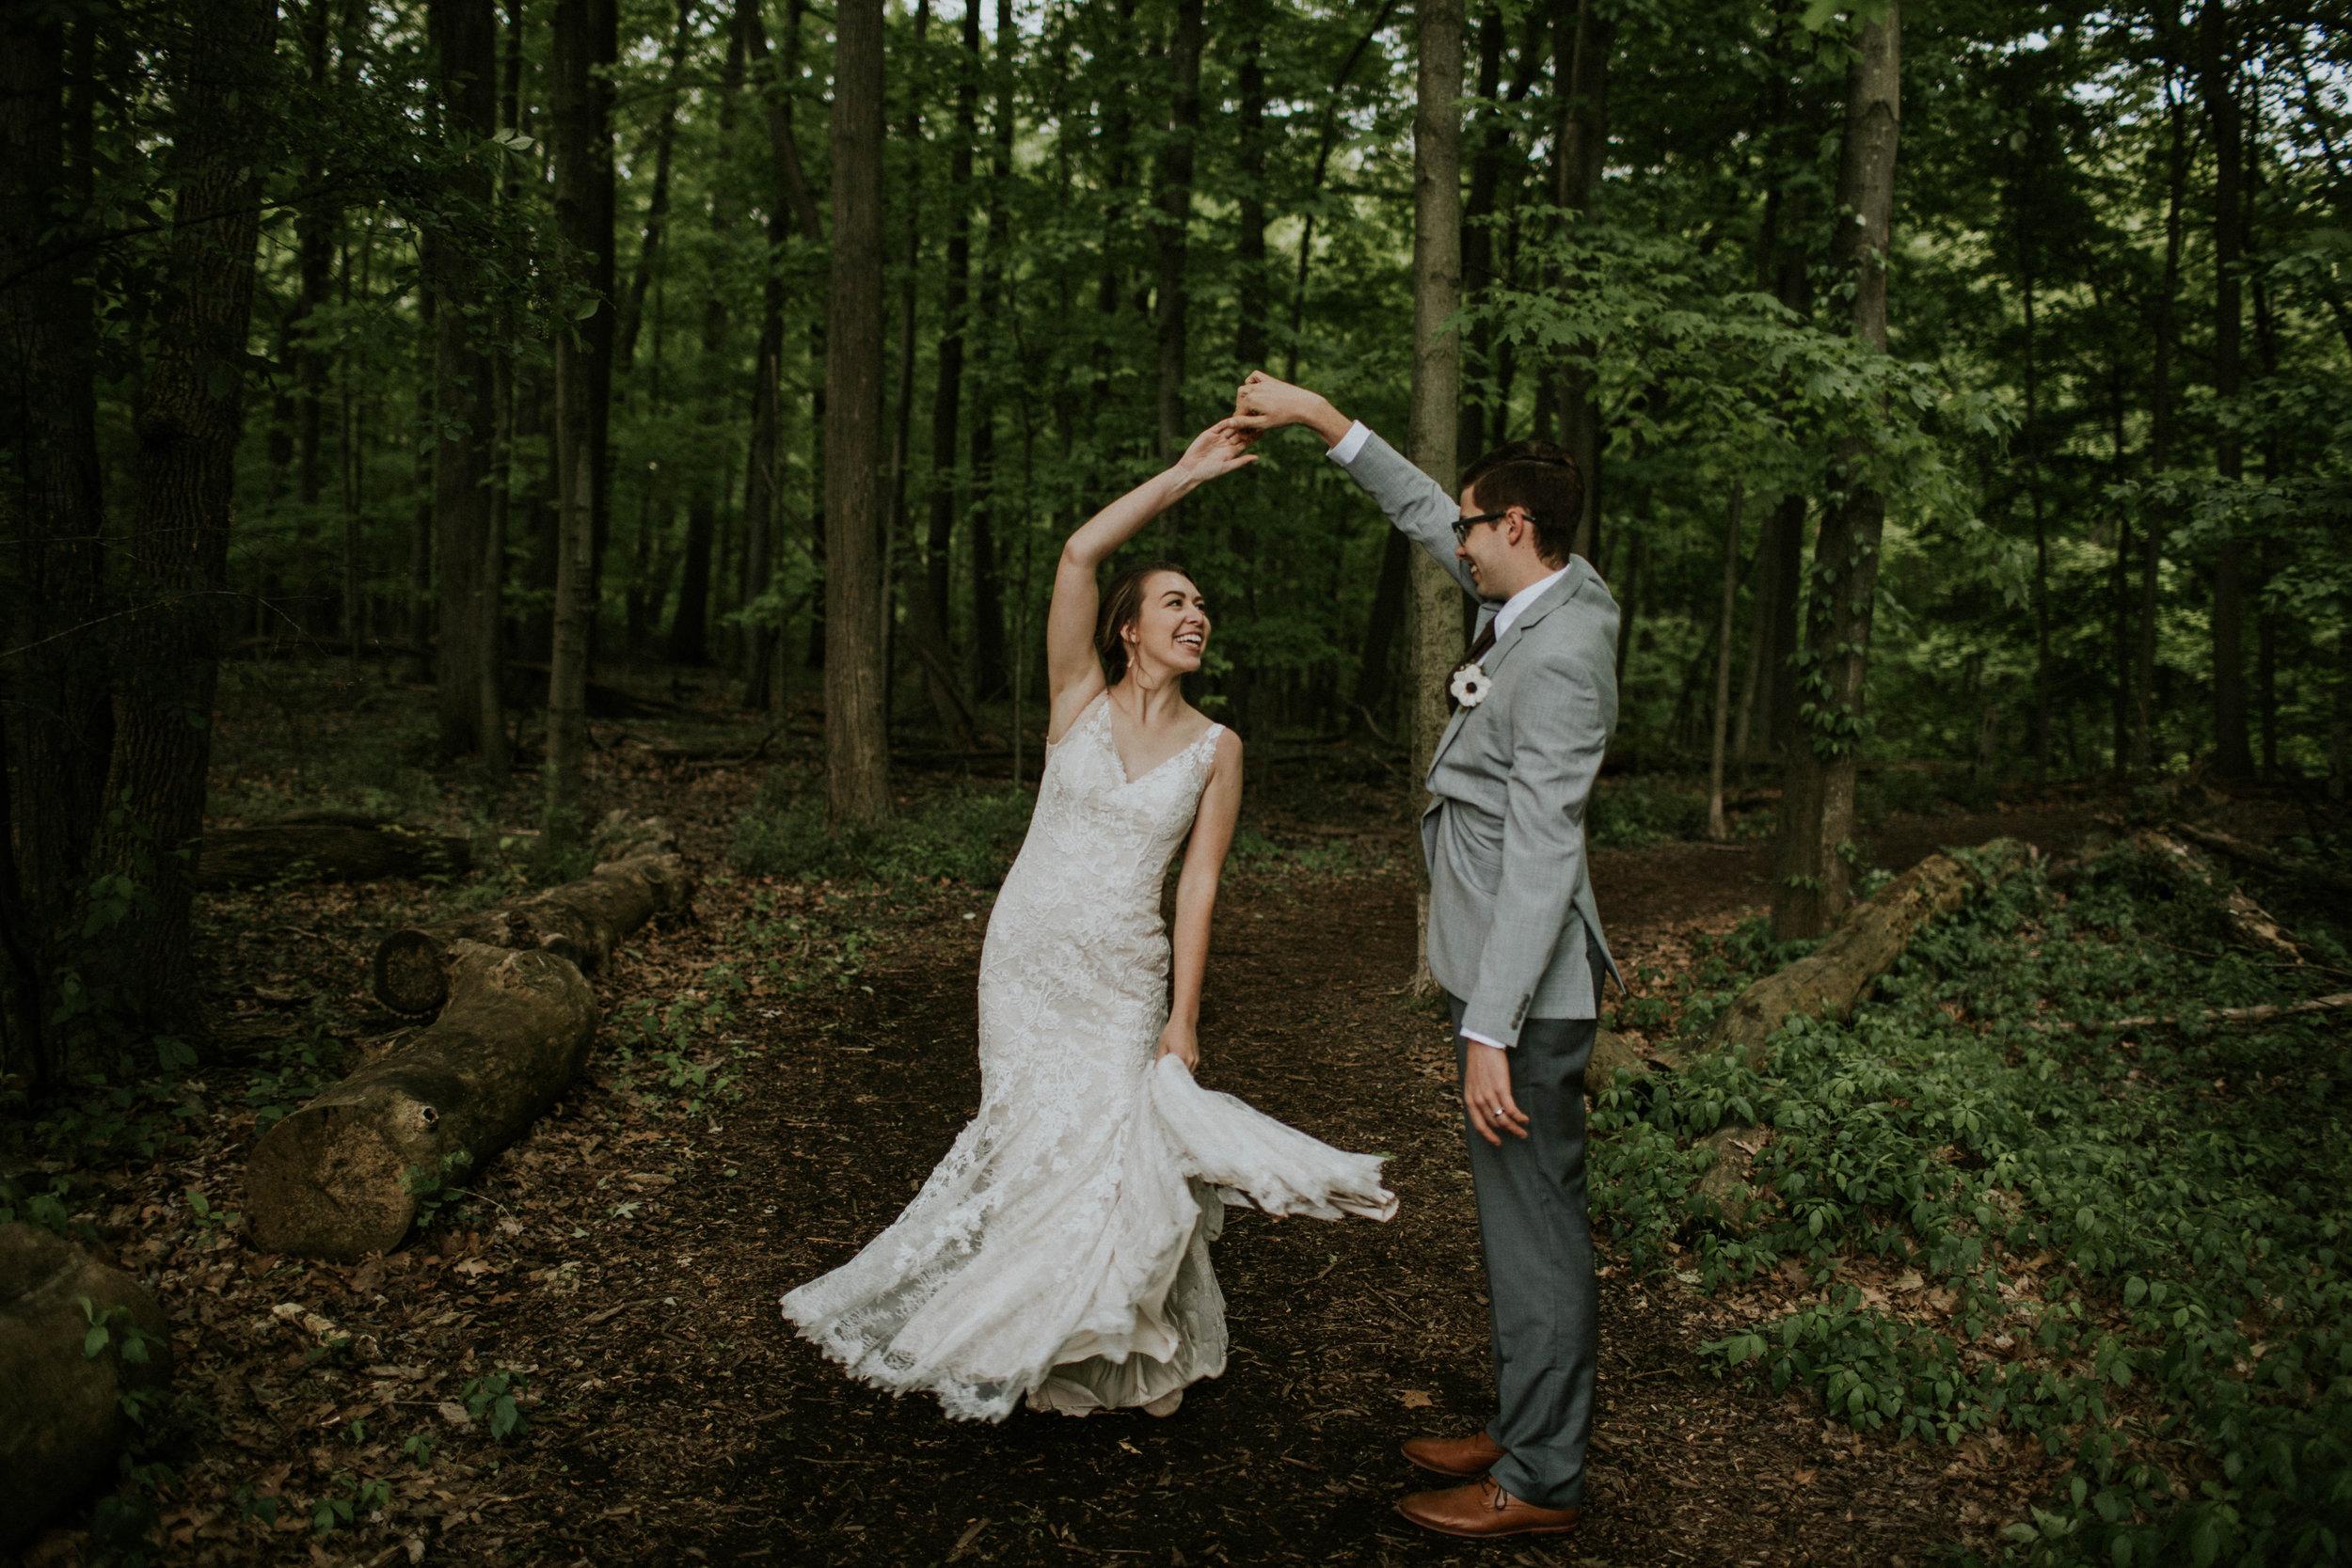 Grace E. Jones Photography